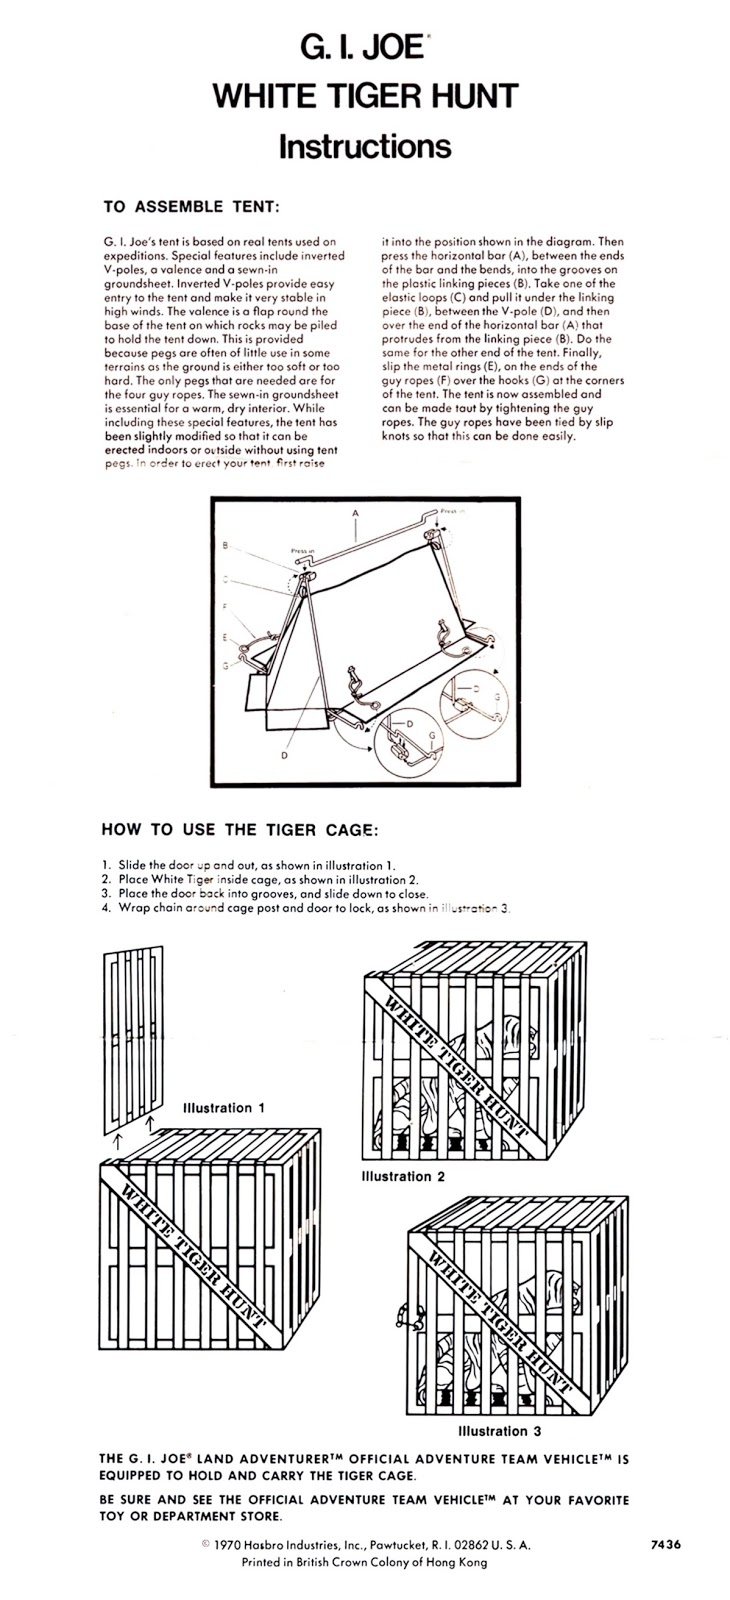 g i joe white tiger hunt instructions aiwaloki s lair tiger skeleton diagram white tiger diagram [ 730 x 1600 Pixel ]